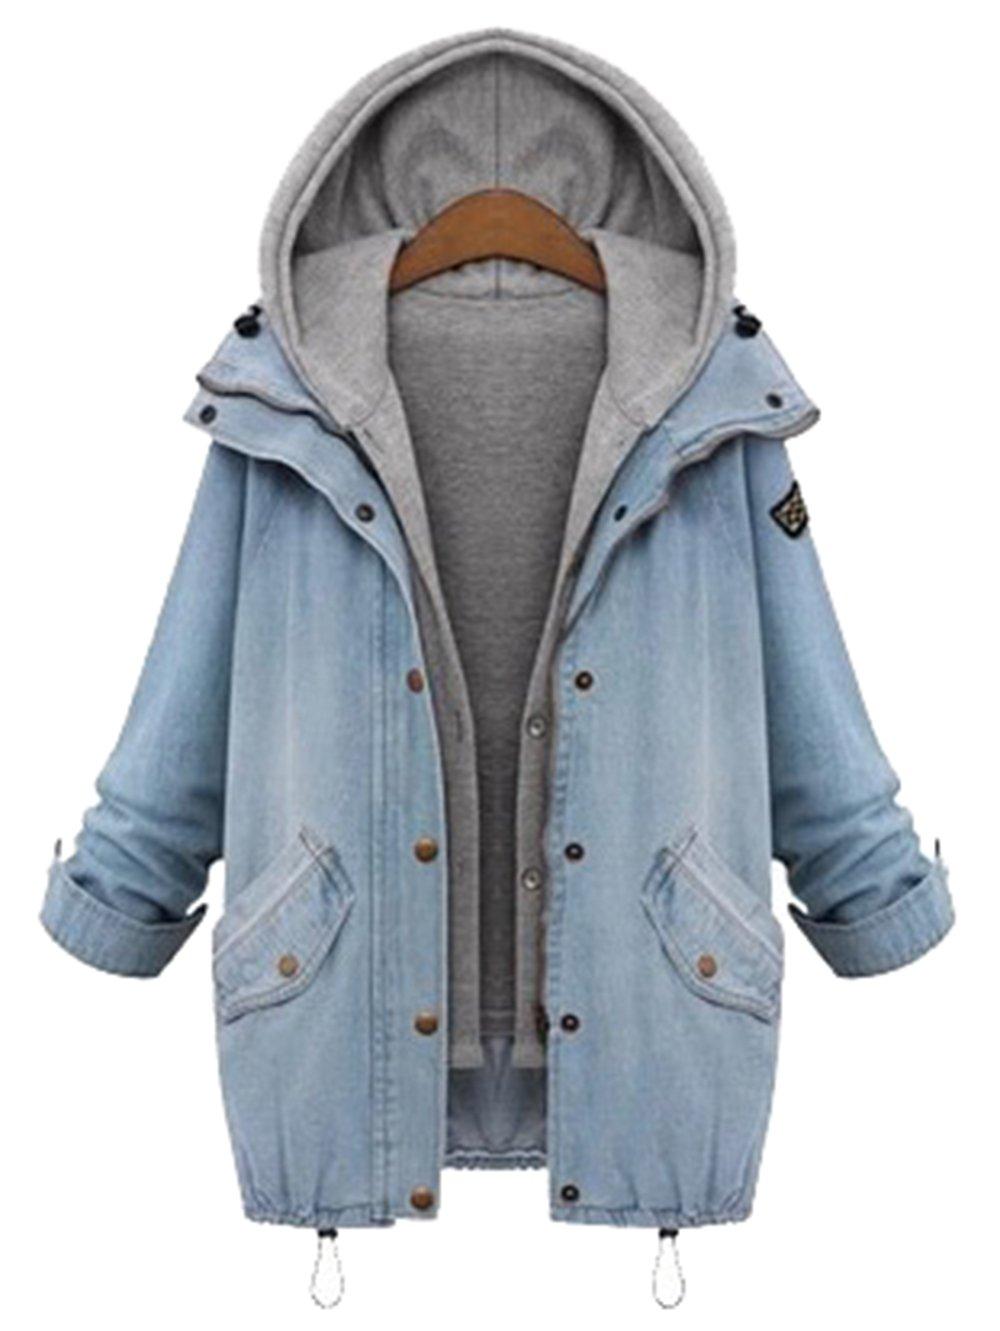 Milumia Women's Hooded Drawstring Boyfriend Trends Jean Swish Pockets Two Piece Coat Jacket Medium Blue by Milumia